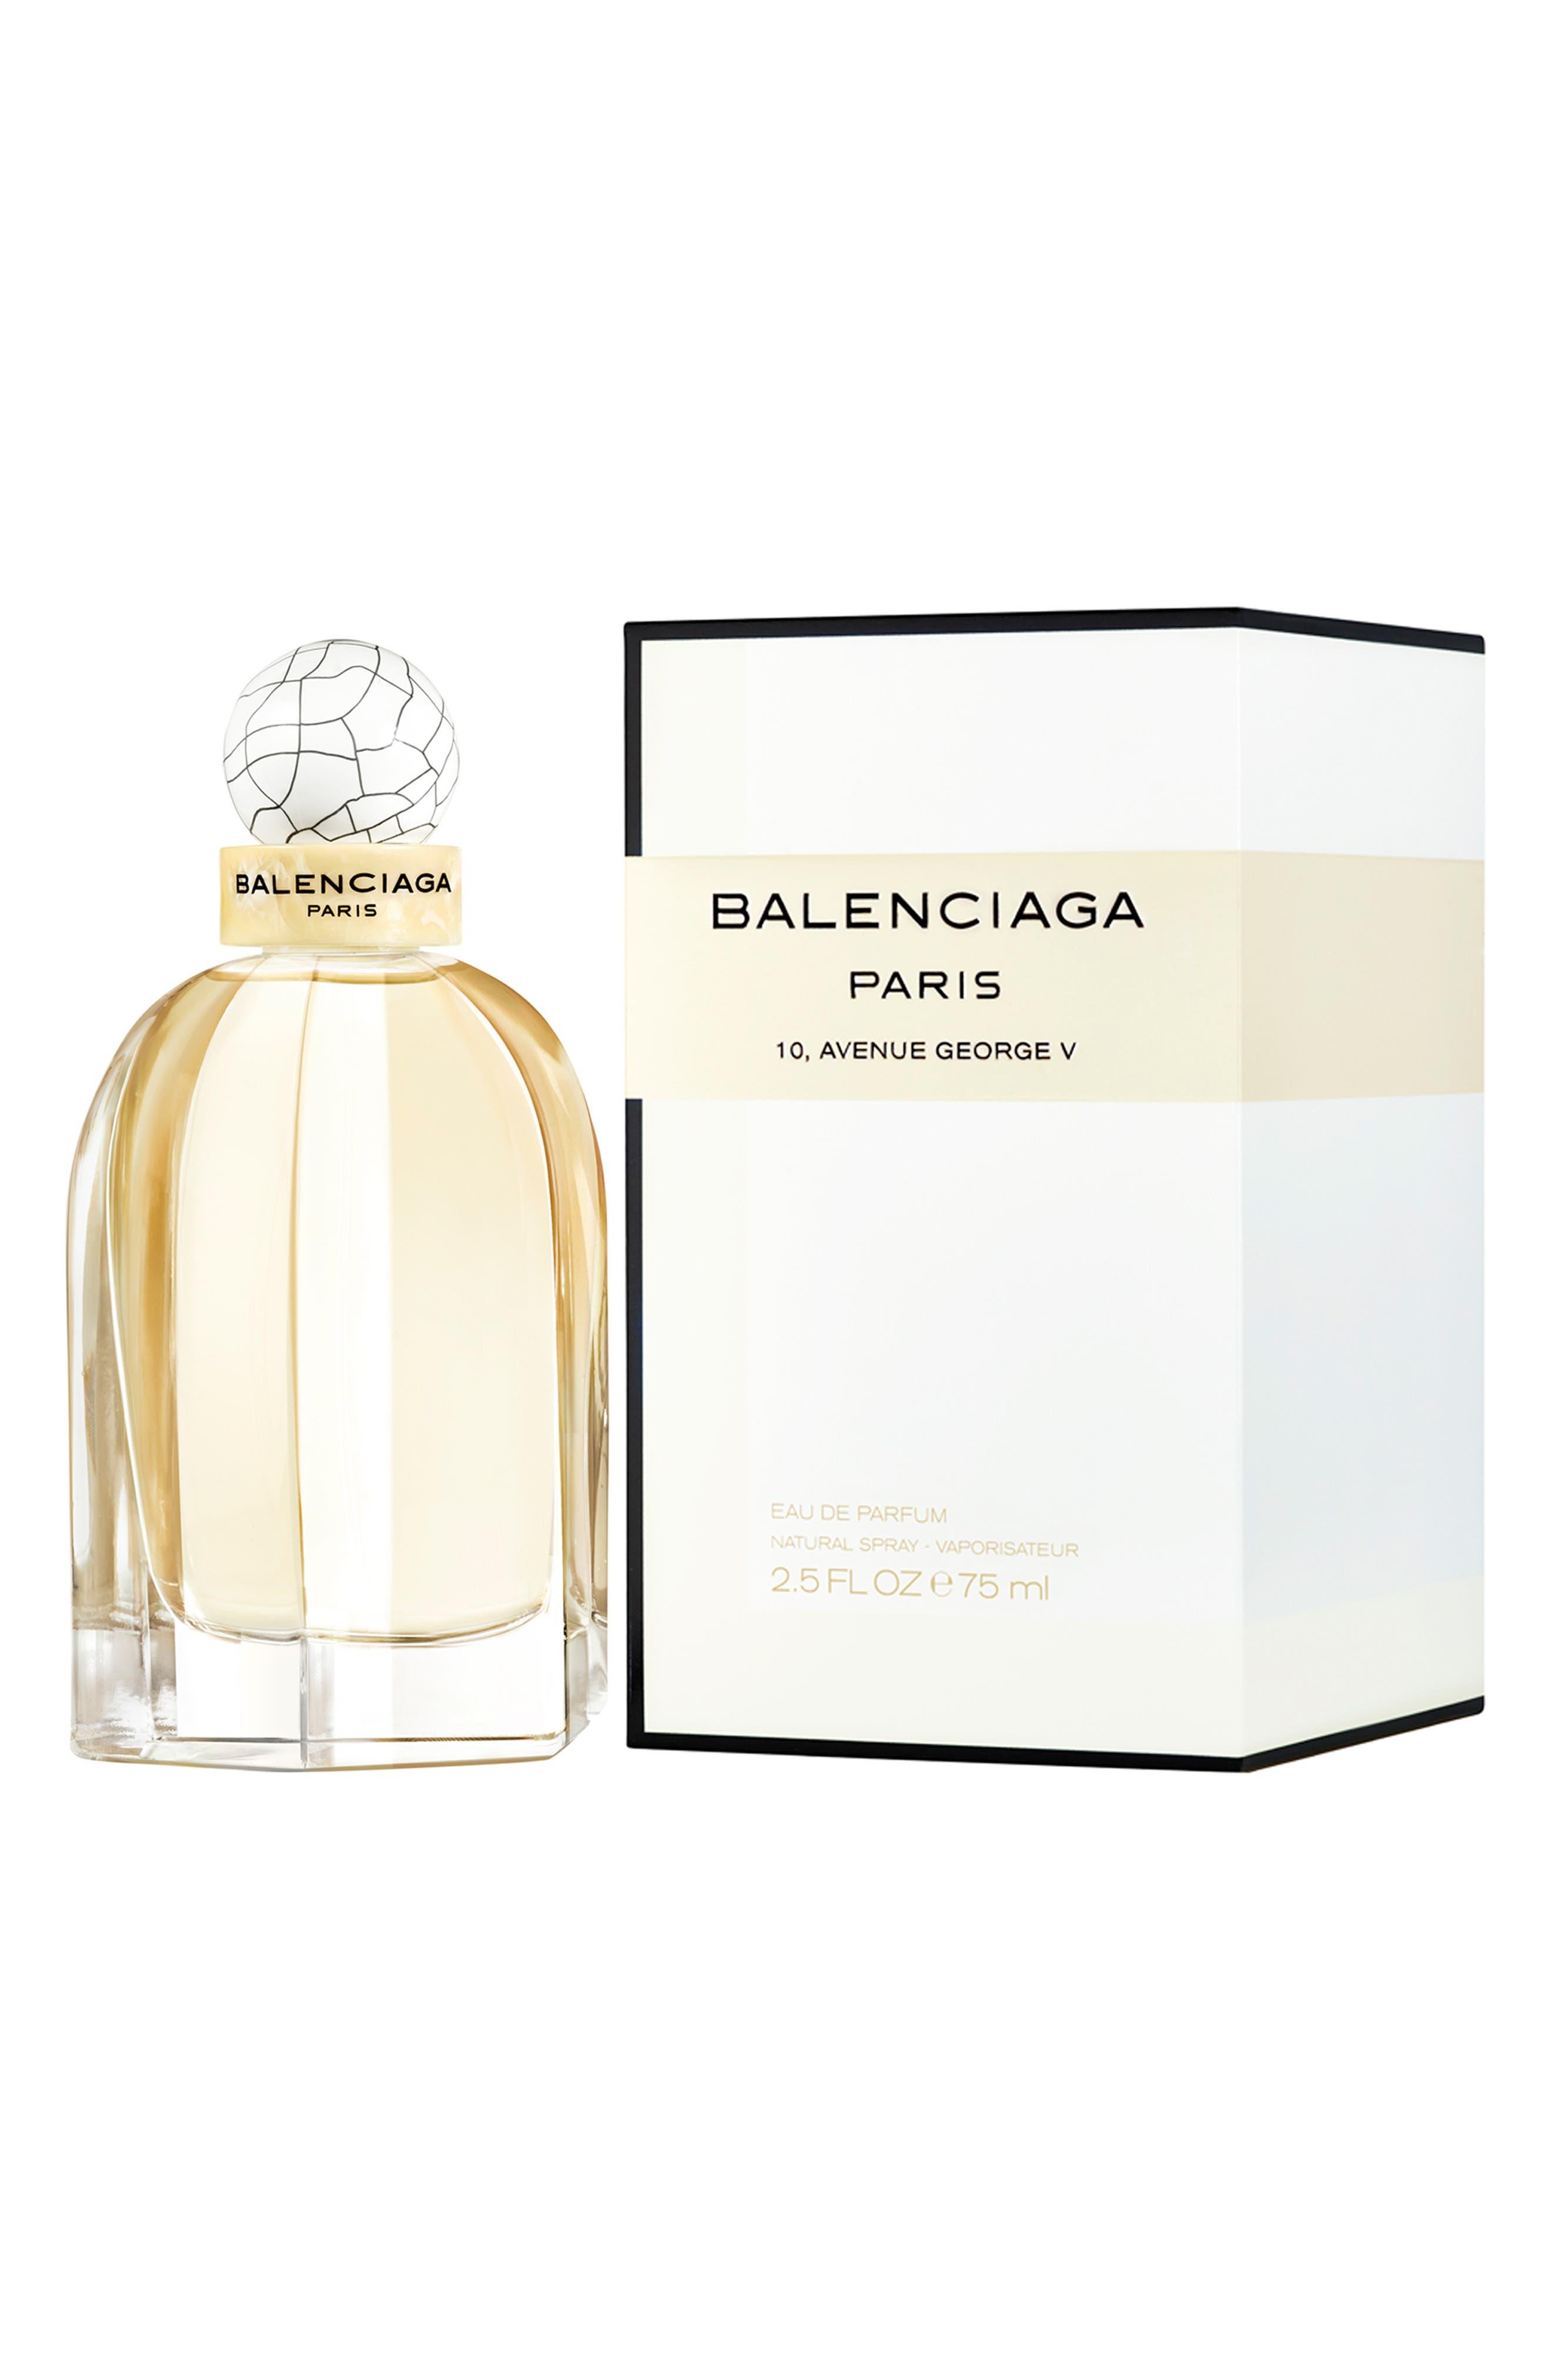 Balenciaga paris forecasting to wear for summer in 2019